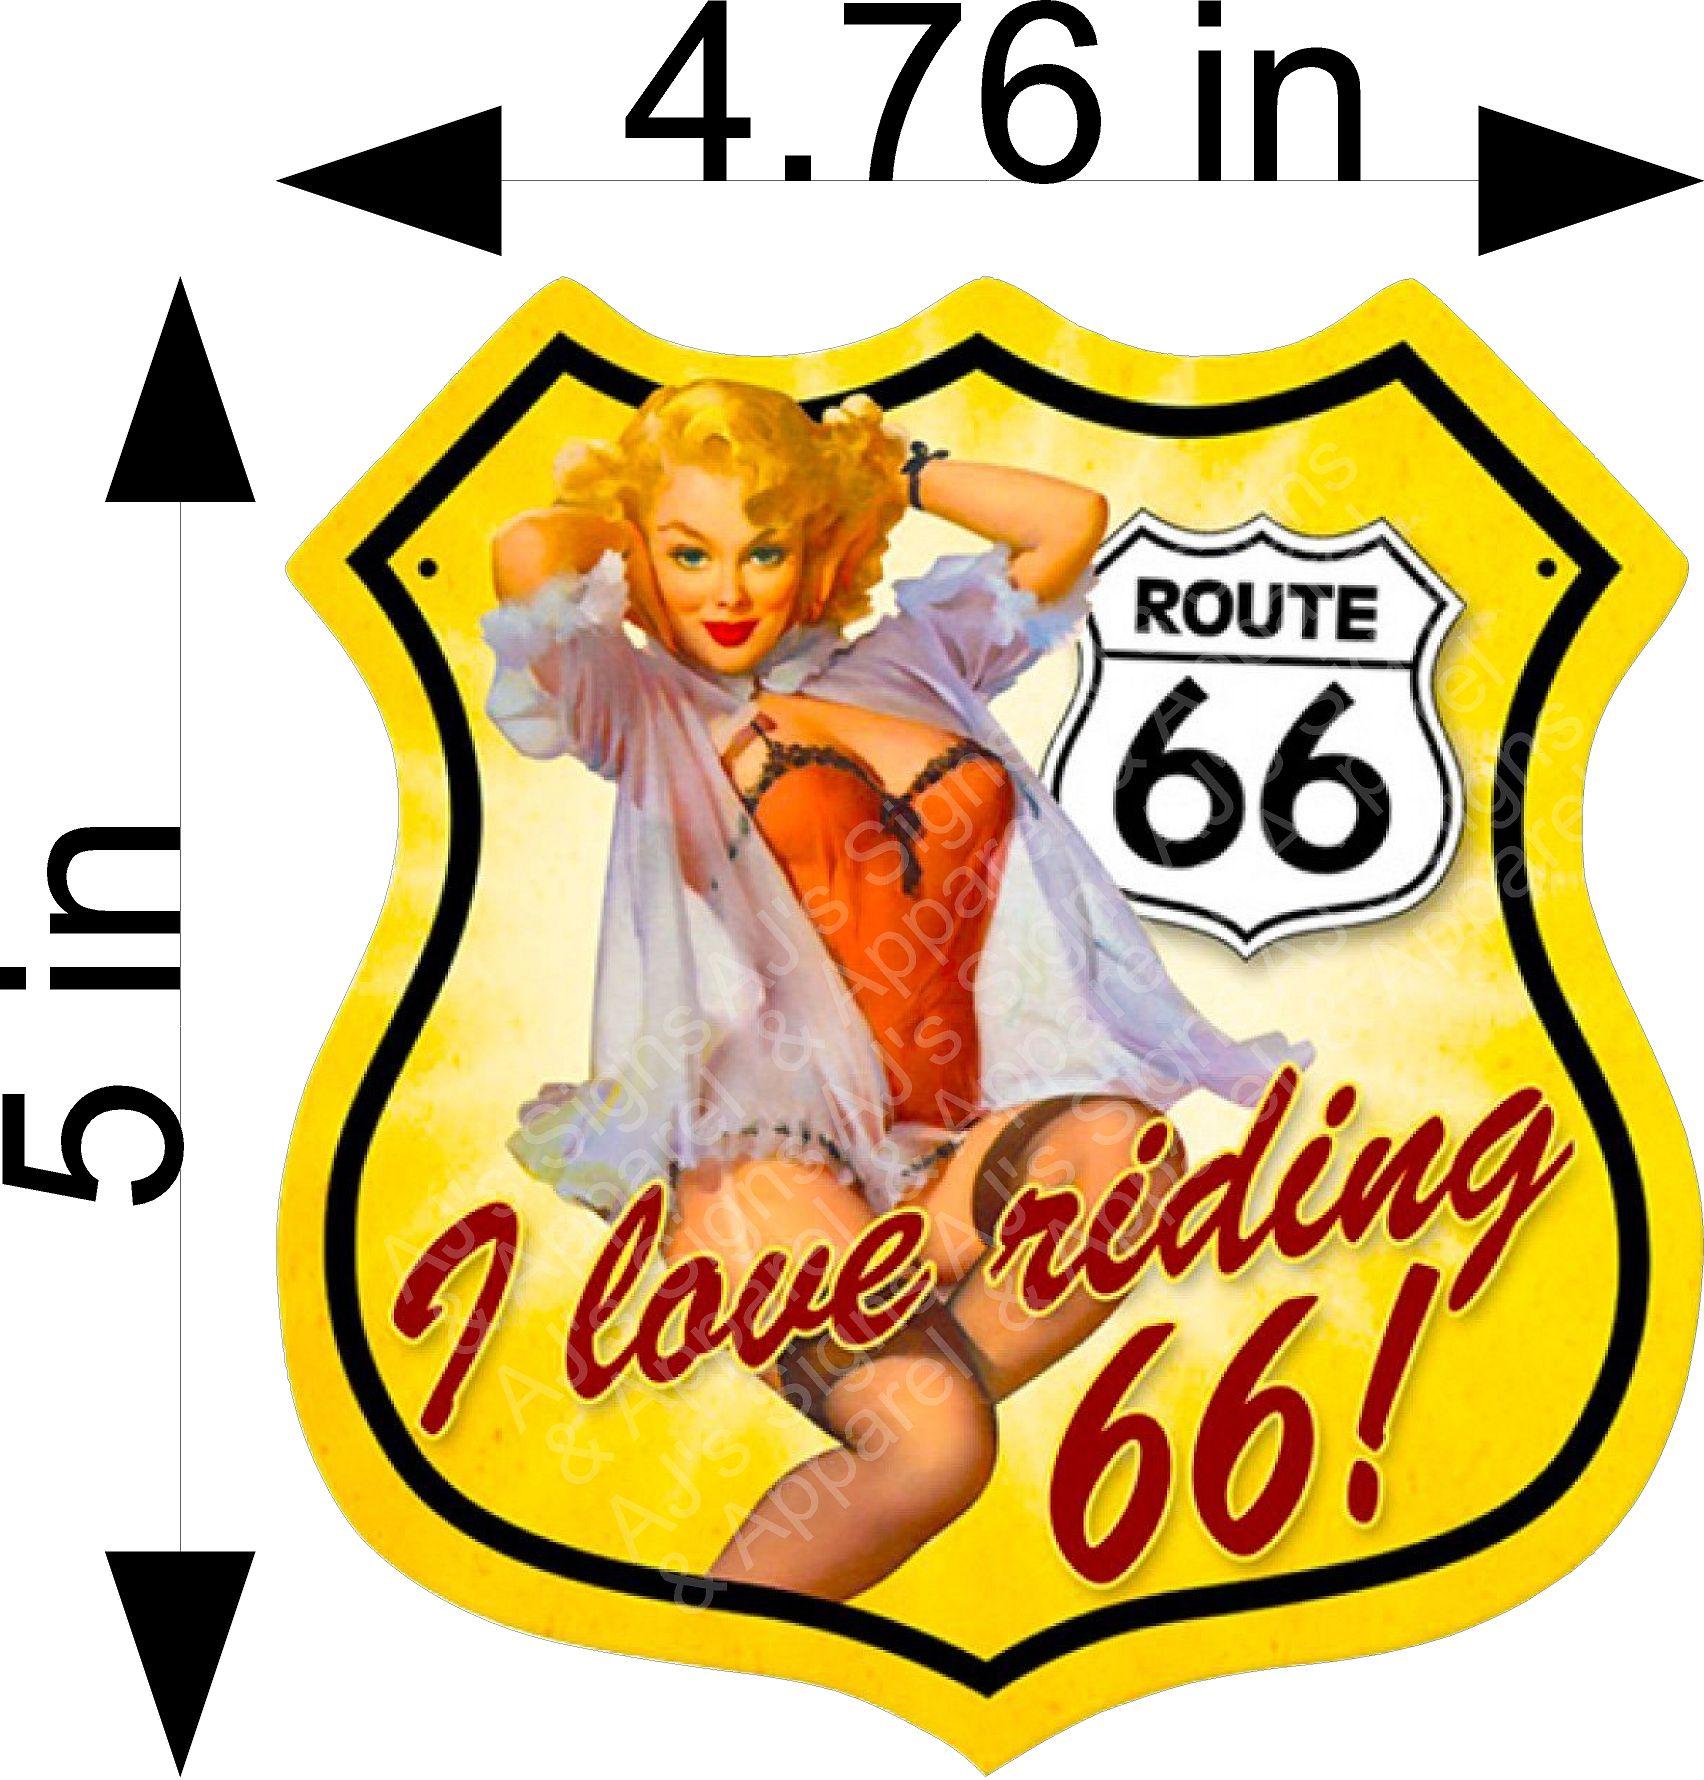 I love Ridding 66 Sticker